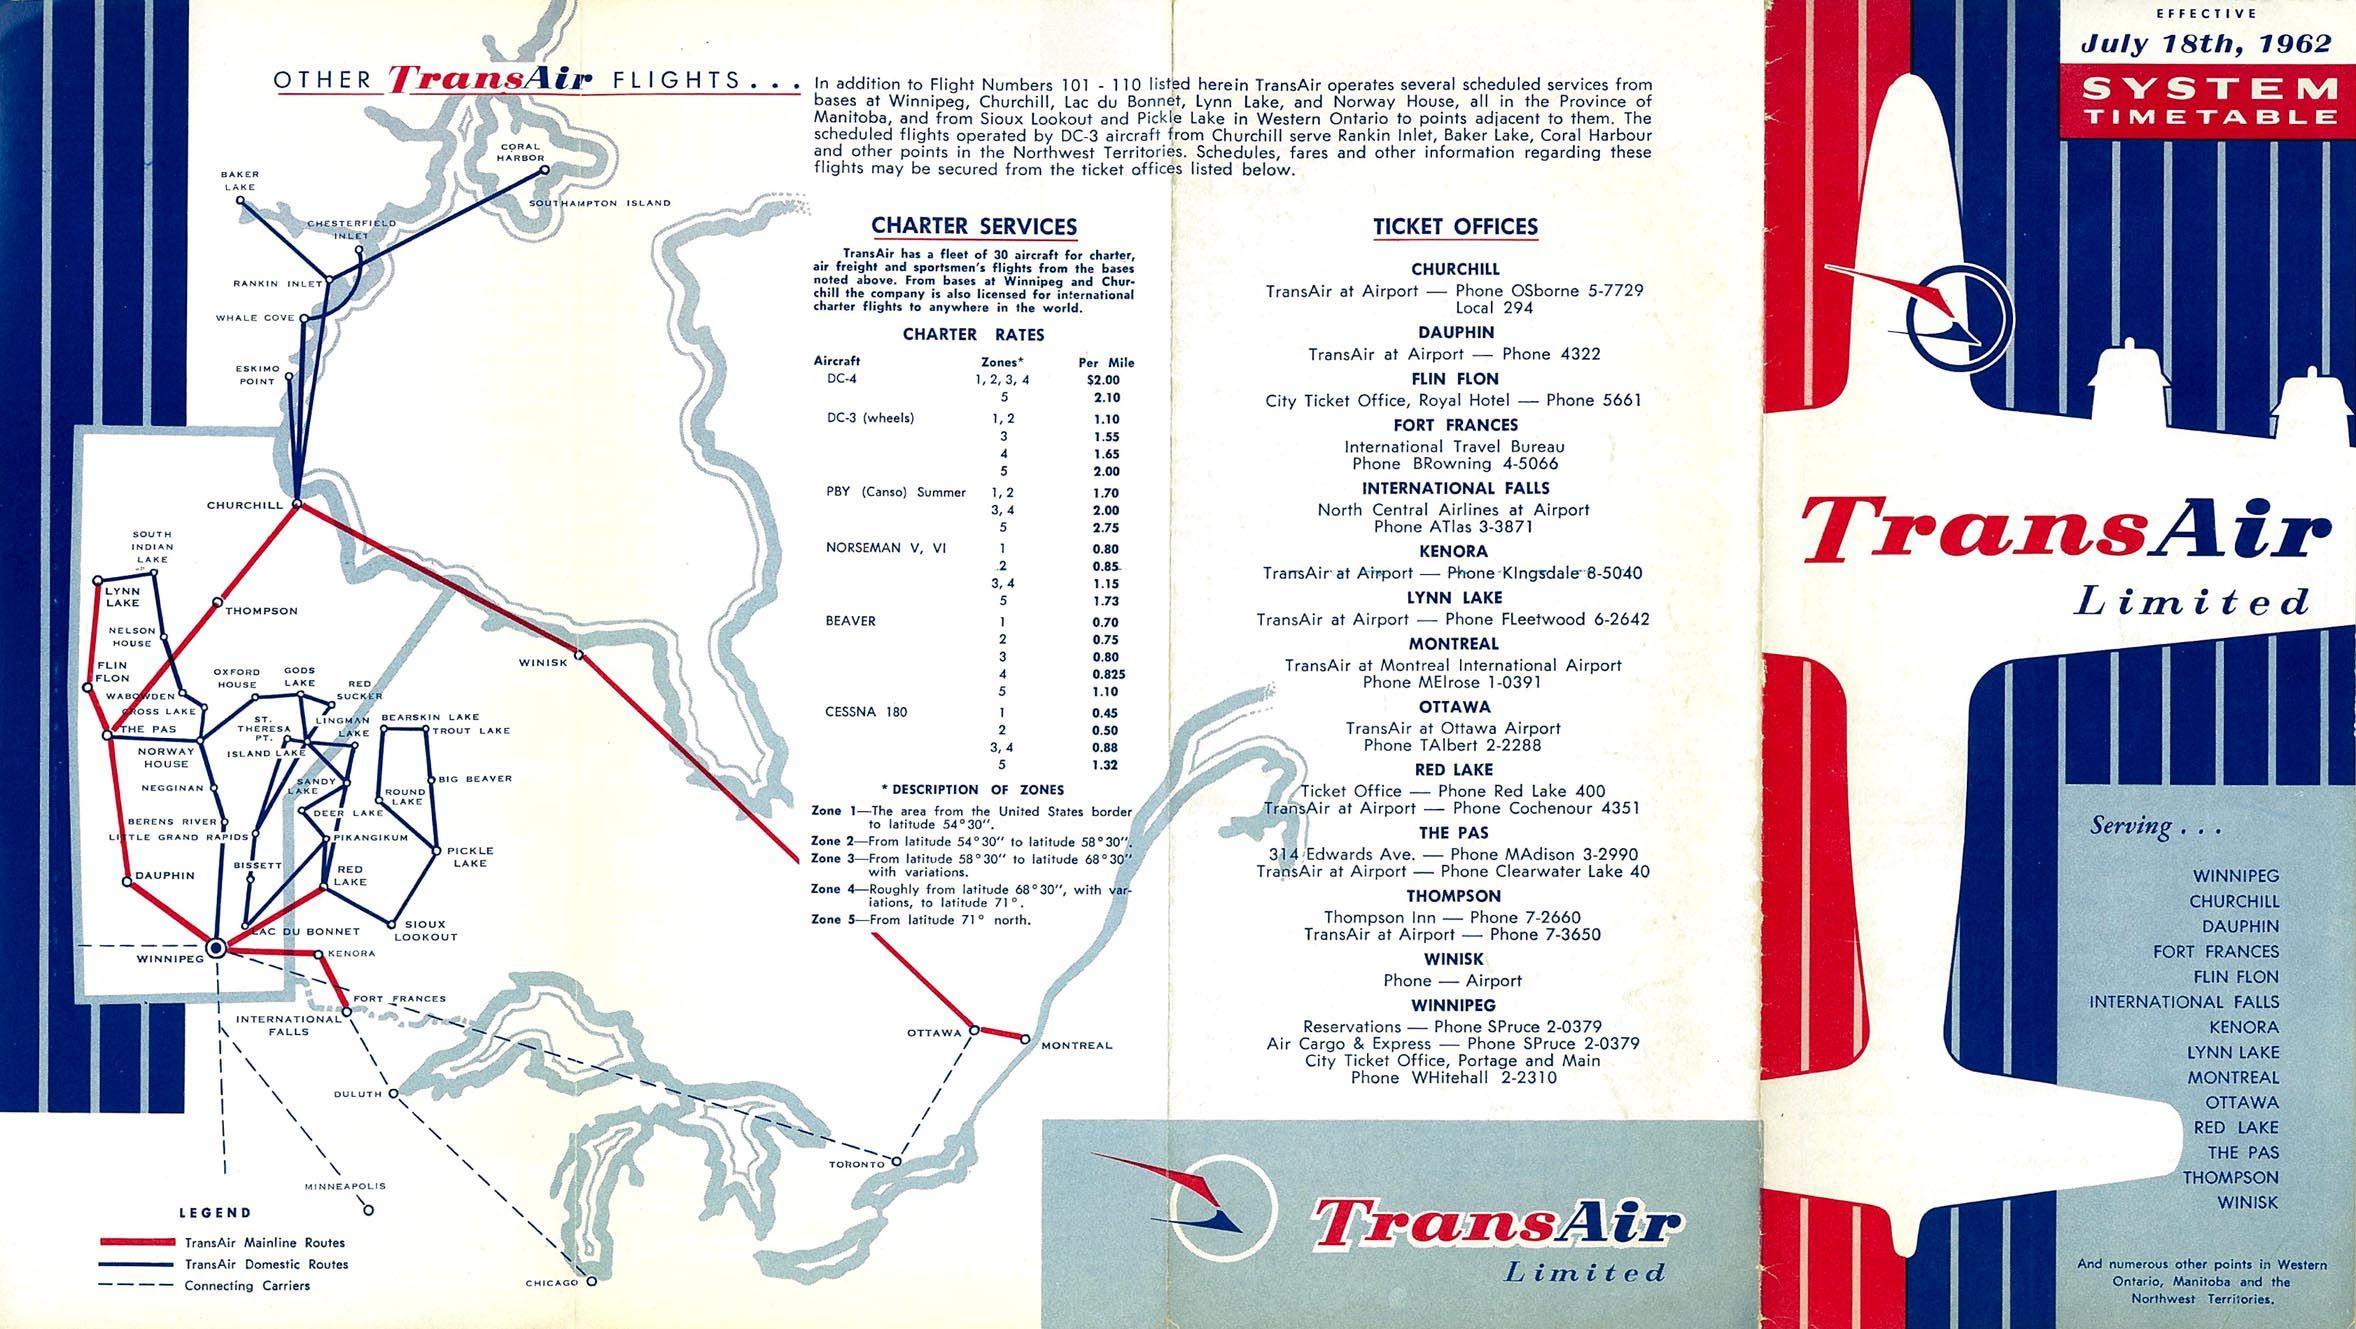 Transair Canada timetable 1962 Airlines, Kenora